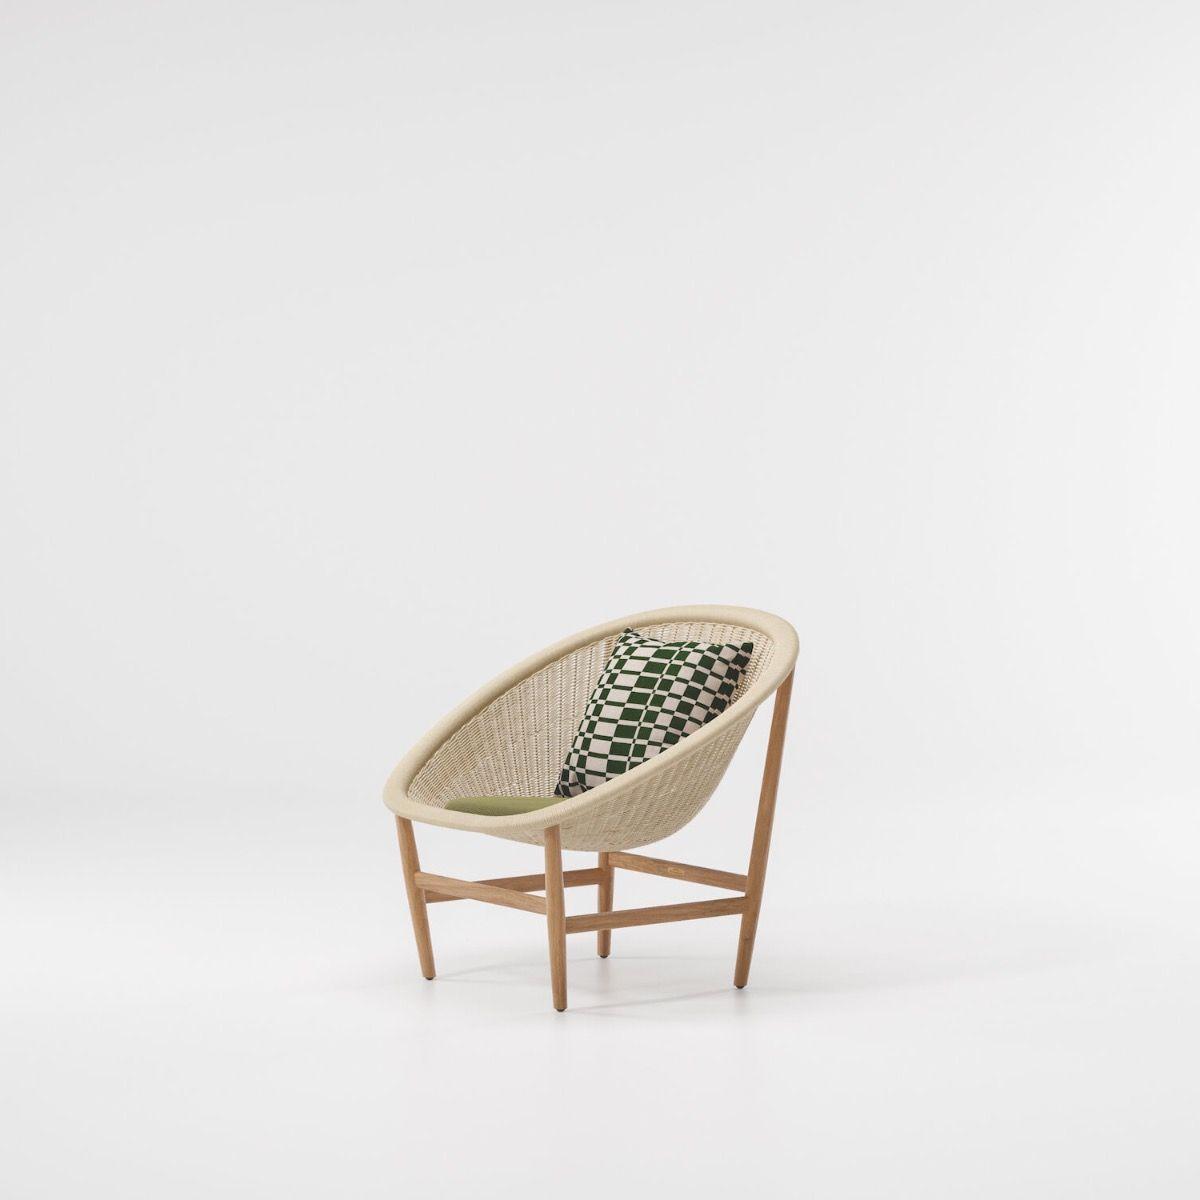 Basket Outdoor Club Chair